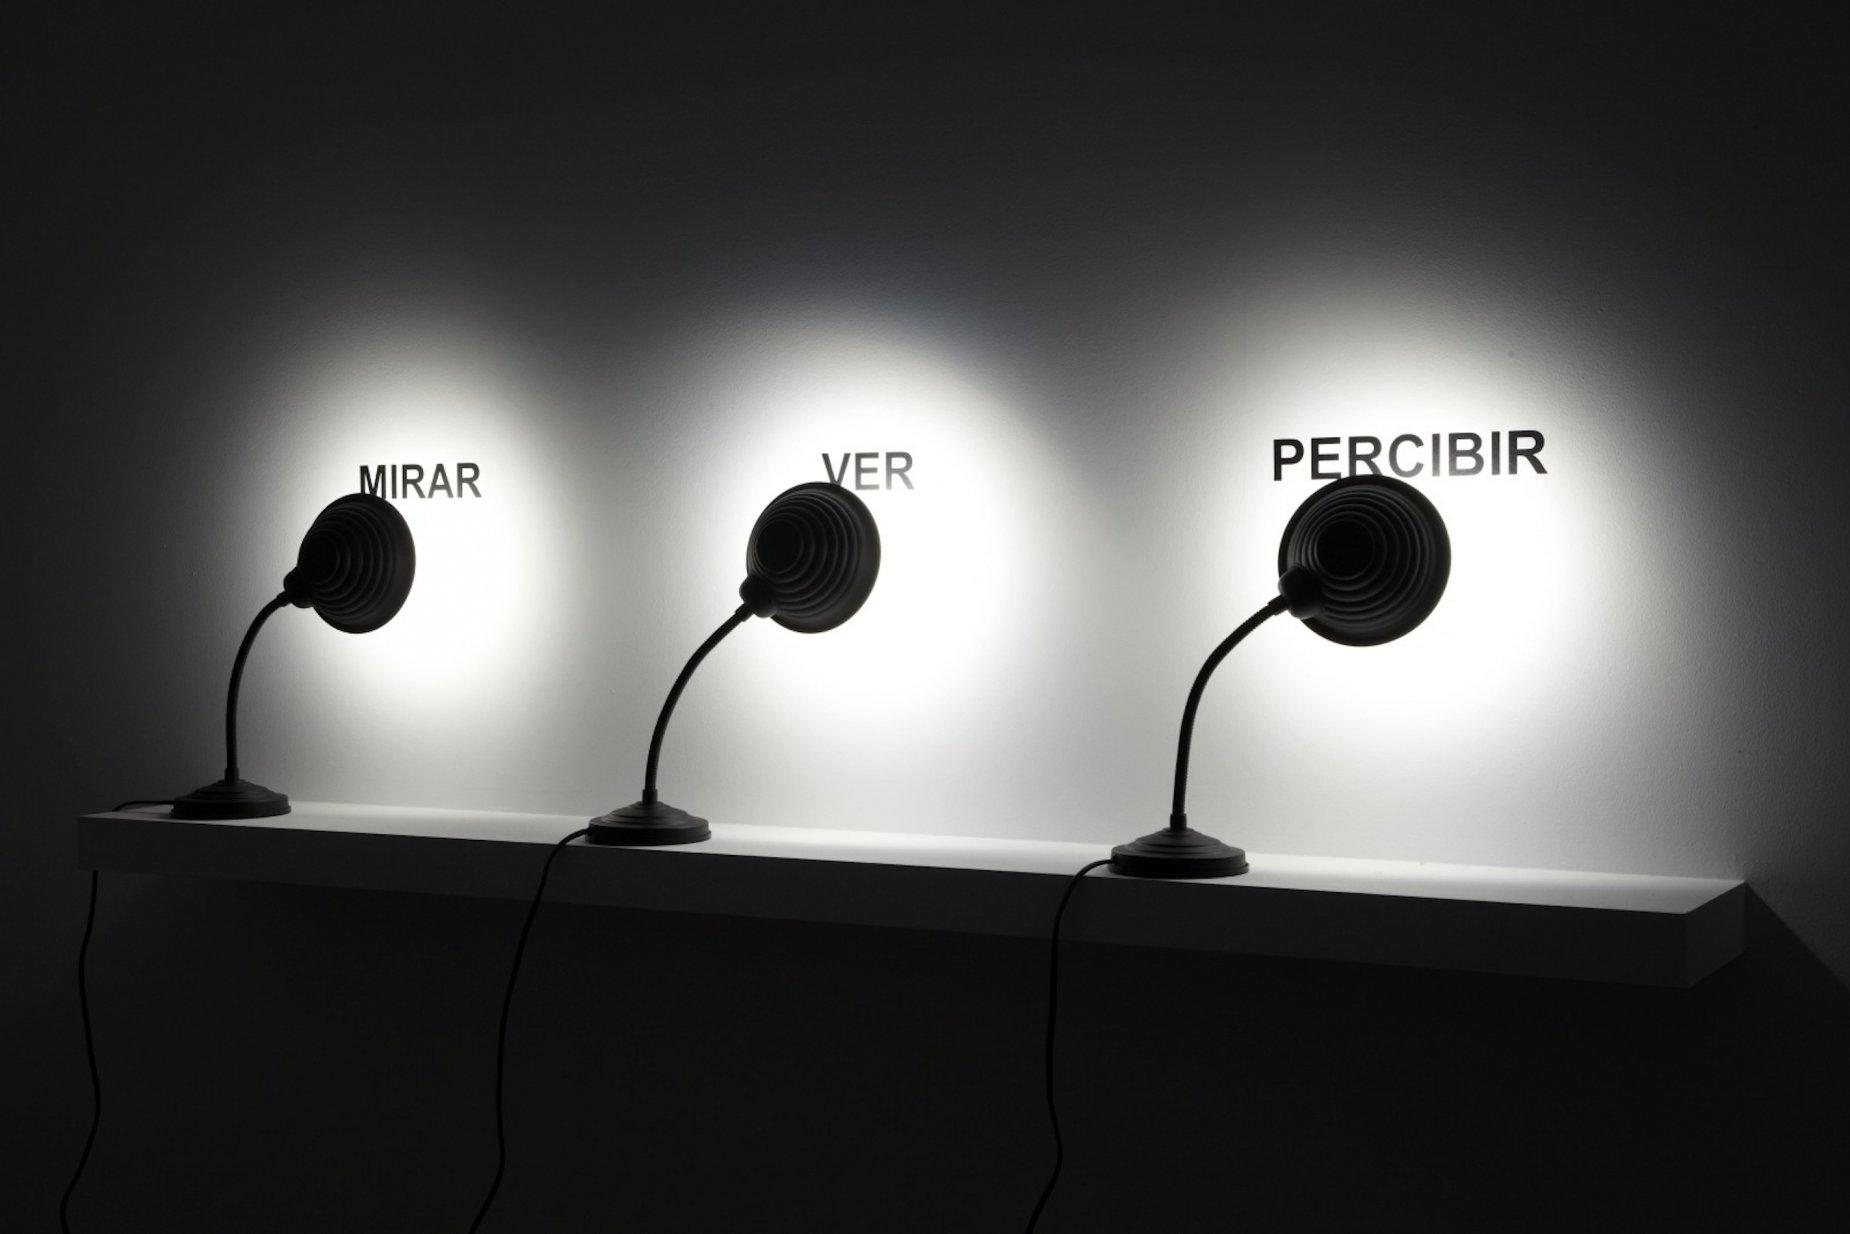 Mirar Ver Percibir (2009) - Antoni Muntadas